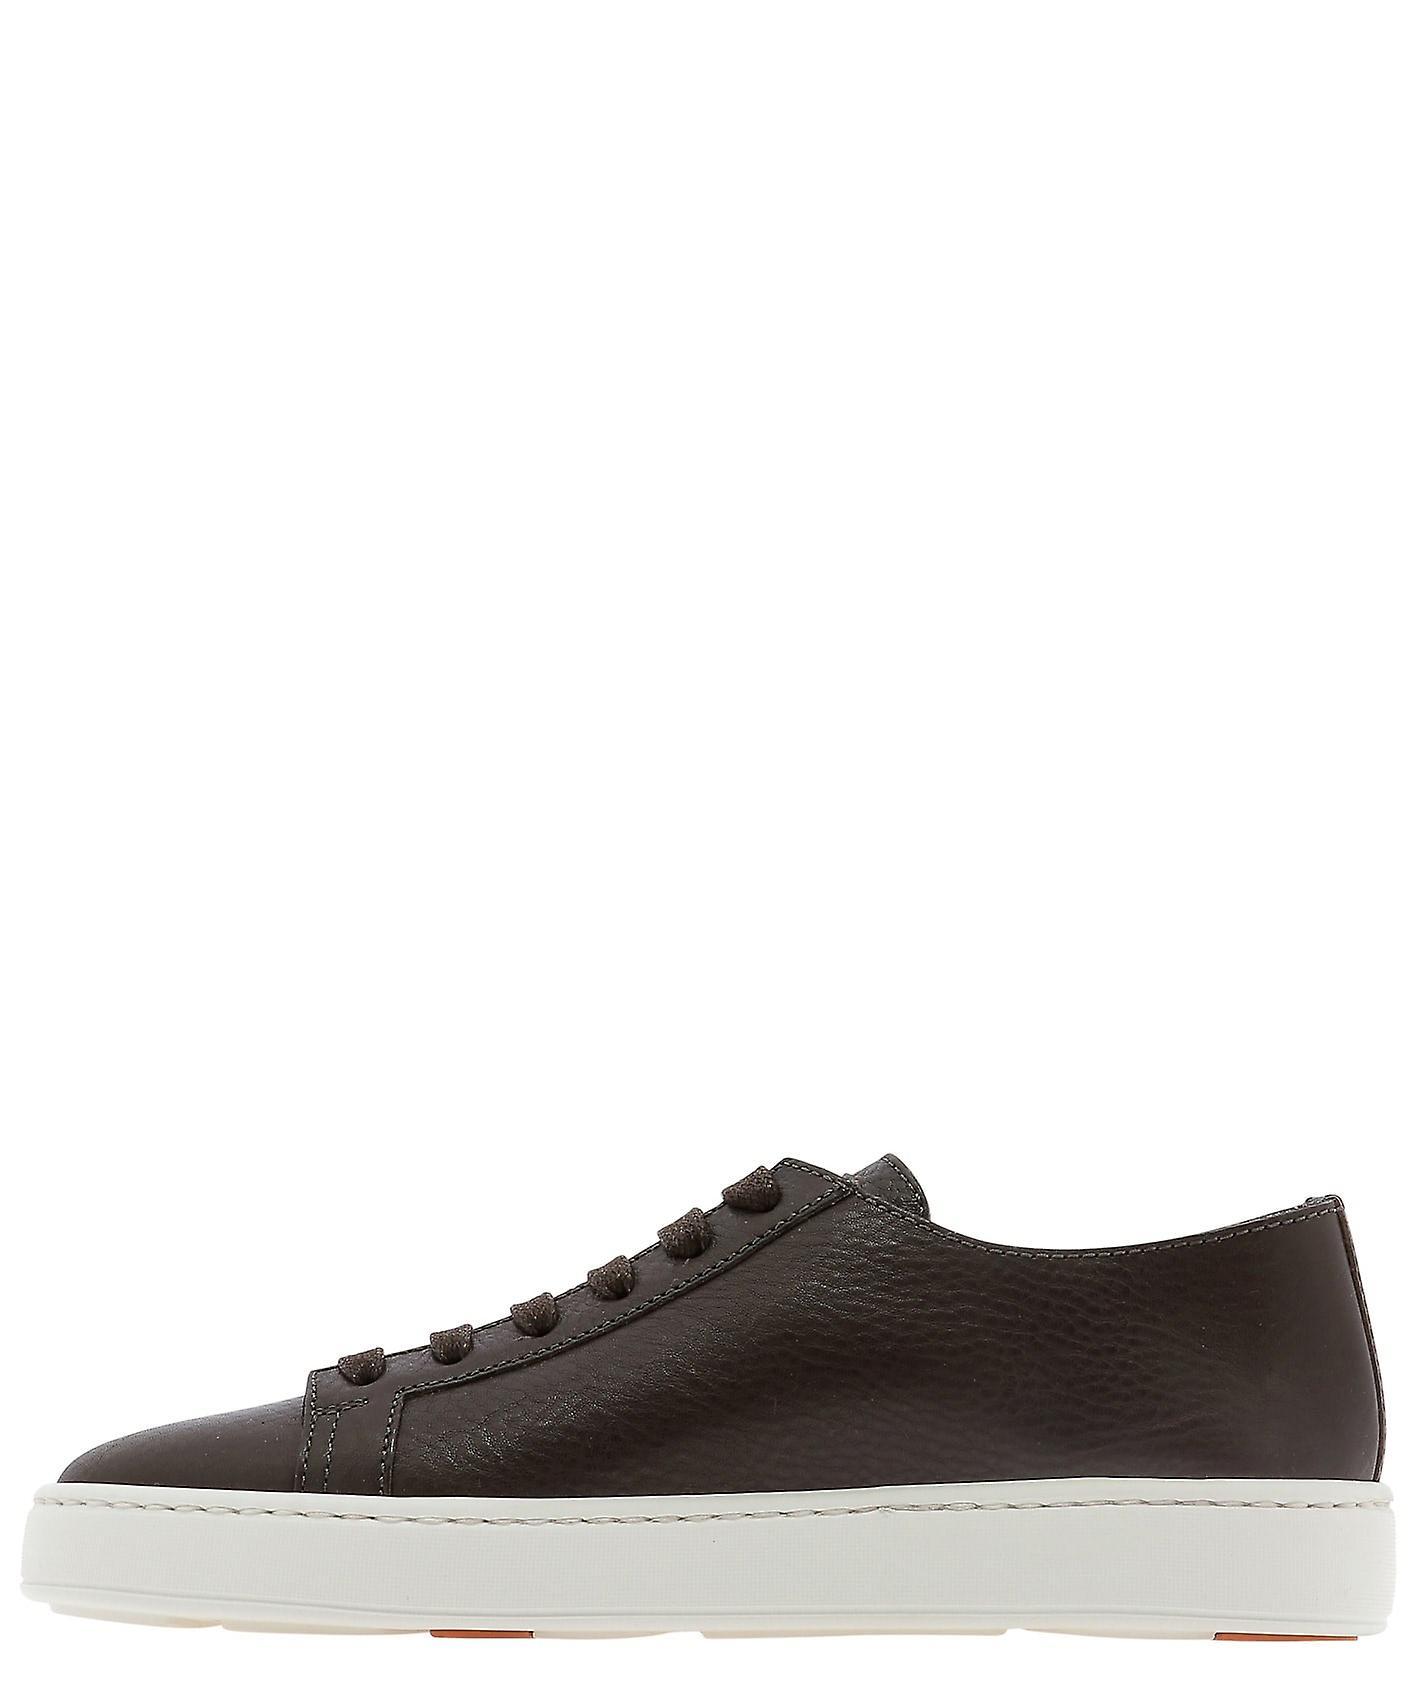 Santoni Mbcn21332barct0vt50 Men-apos;s Brown Leather Sneakers